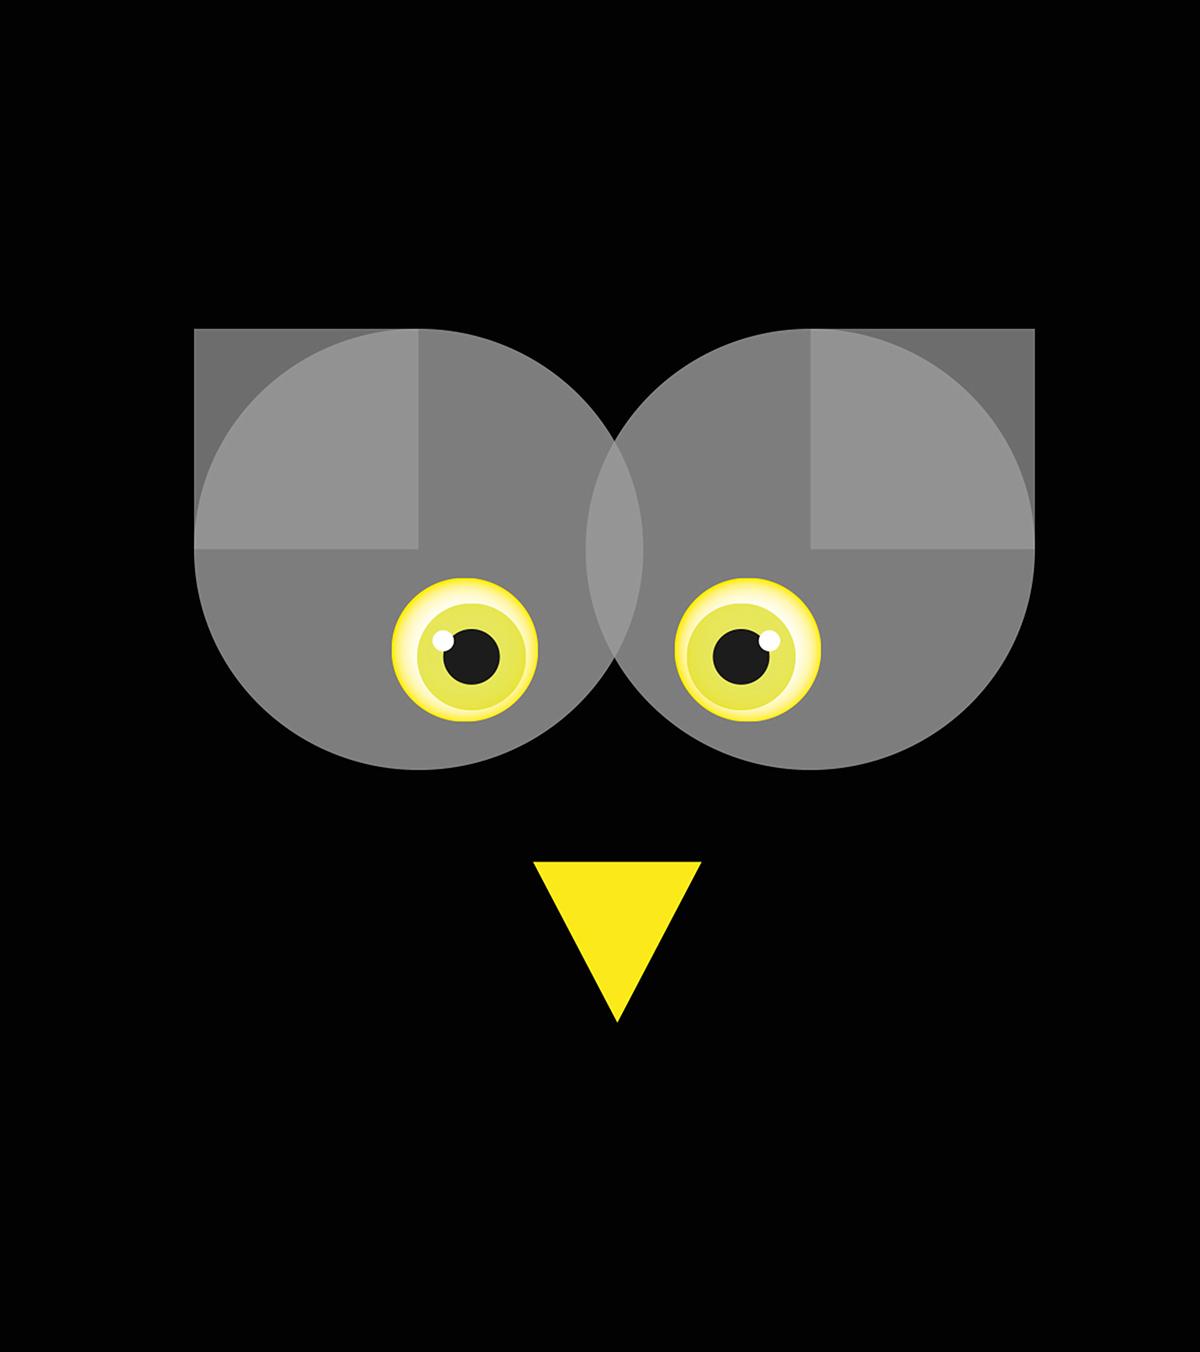 #animal #animals #vector #illustrator #graphicdesigner #T-Shirt #abbigliamento #moda